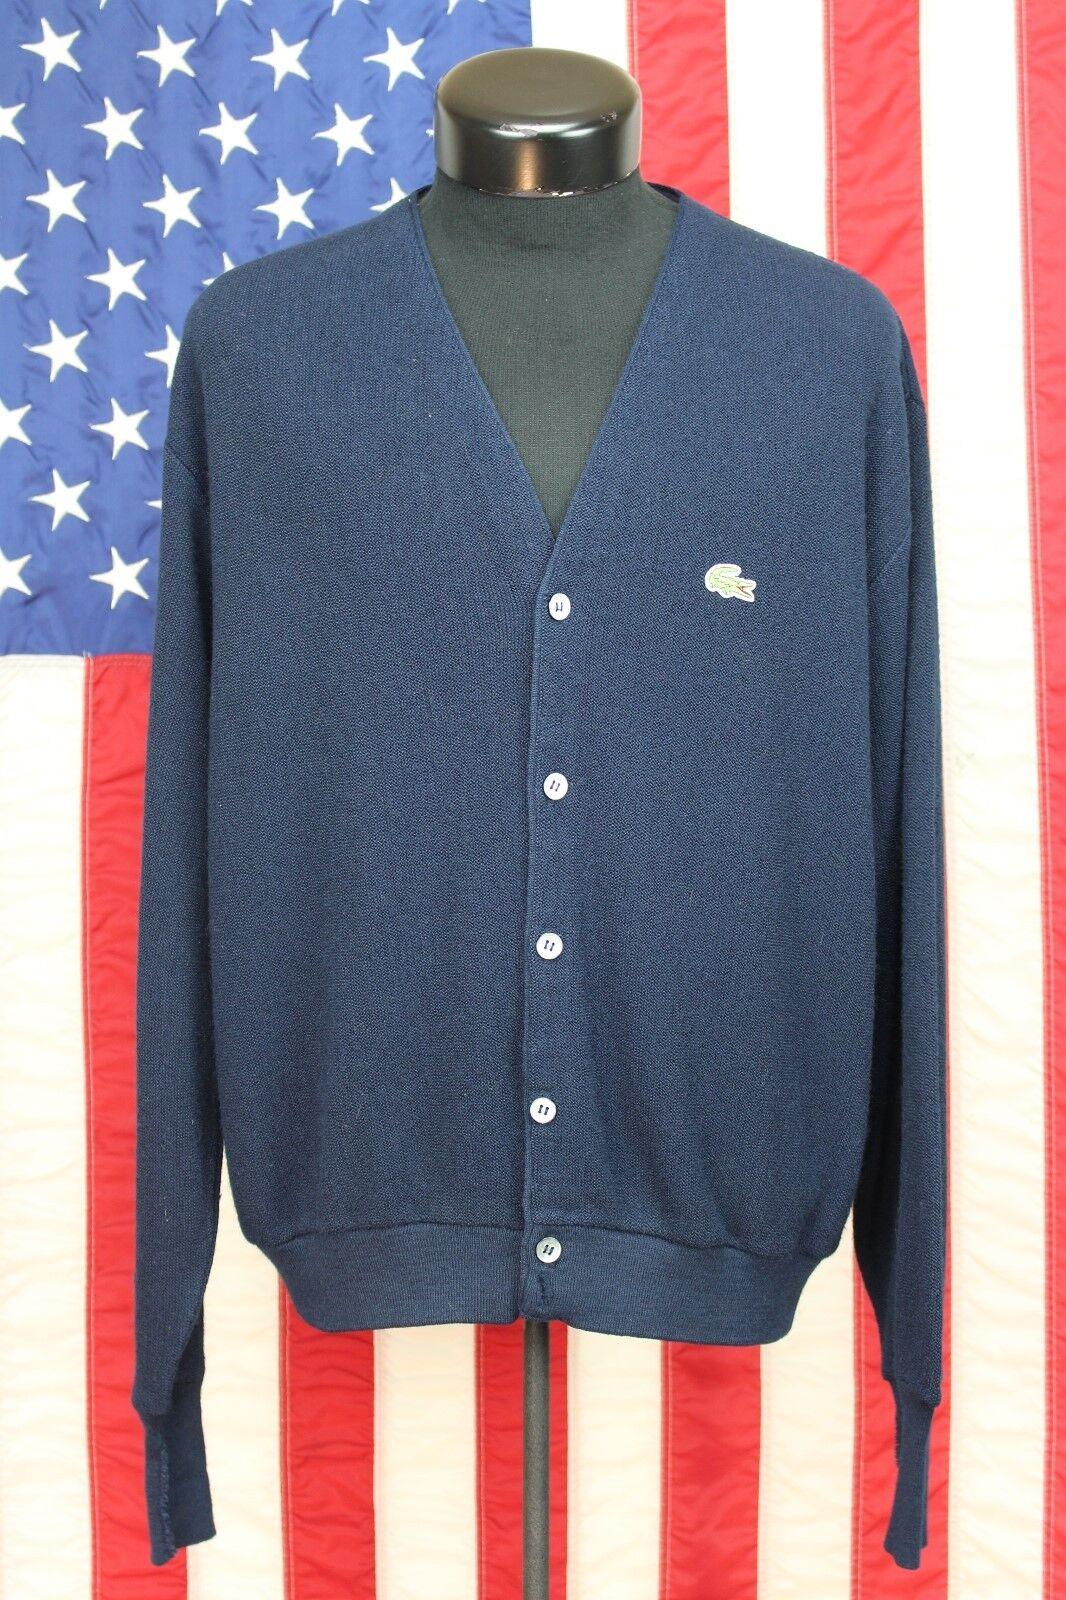 Men Izod Lacoste Made USA Carigan L Shirt Sweater Long Sleeve bluee Gator Tennis